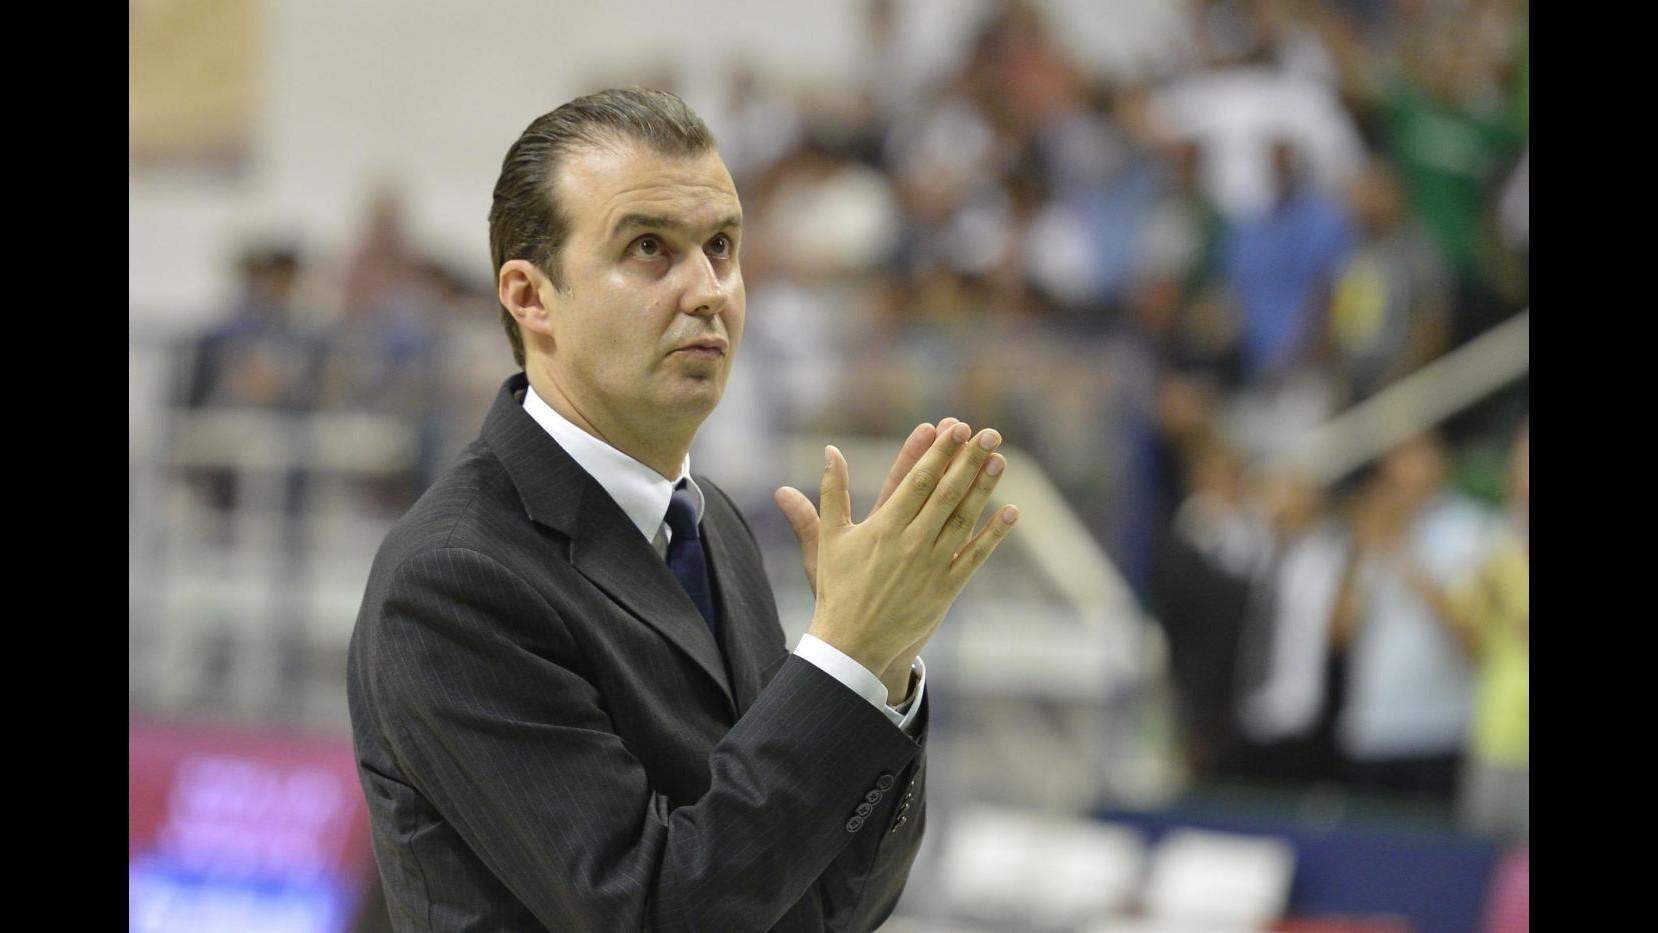 Basket, Simone Pianigiani lascia la panchina del Fenerbahce